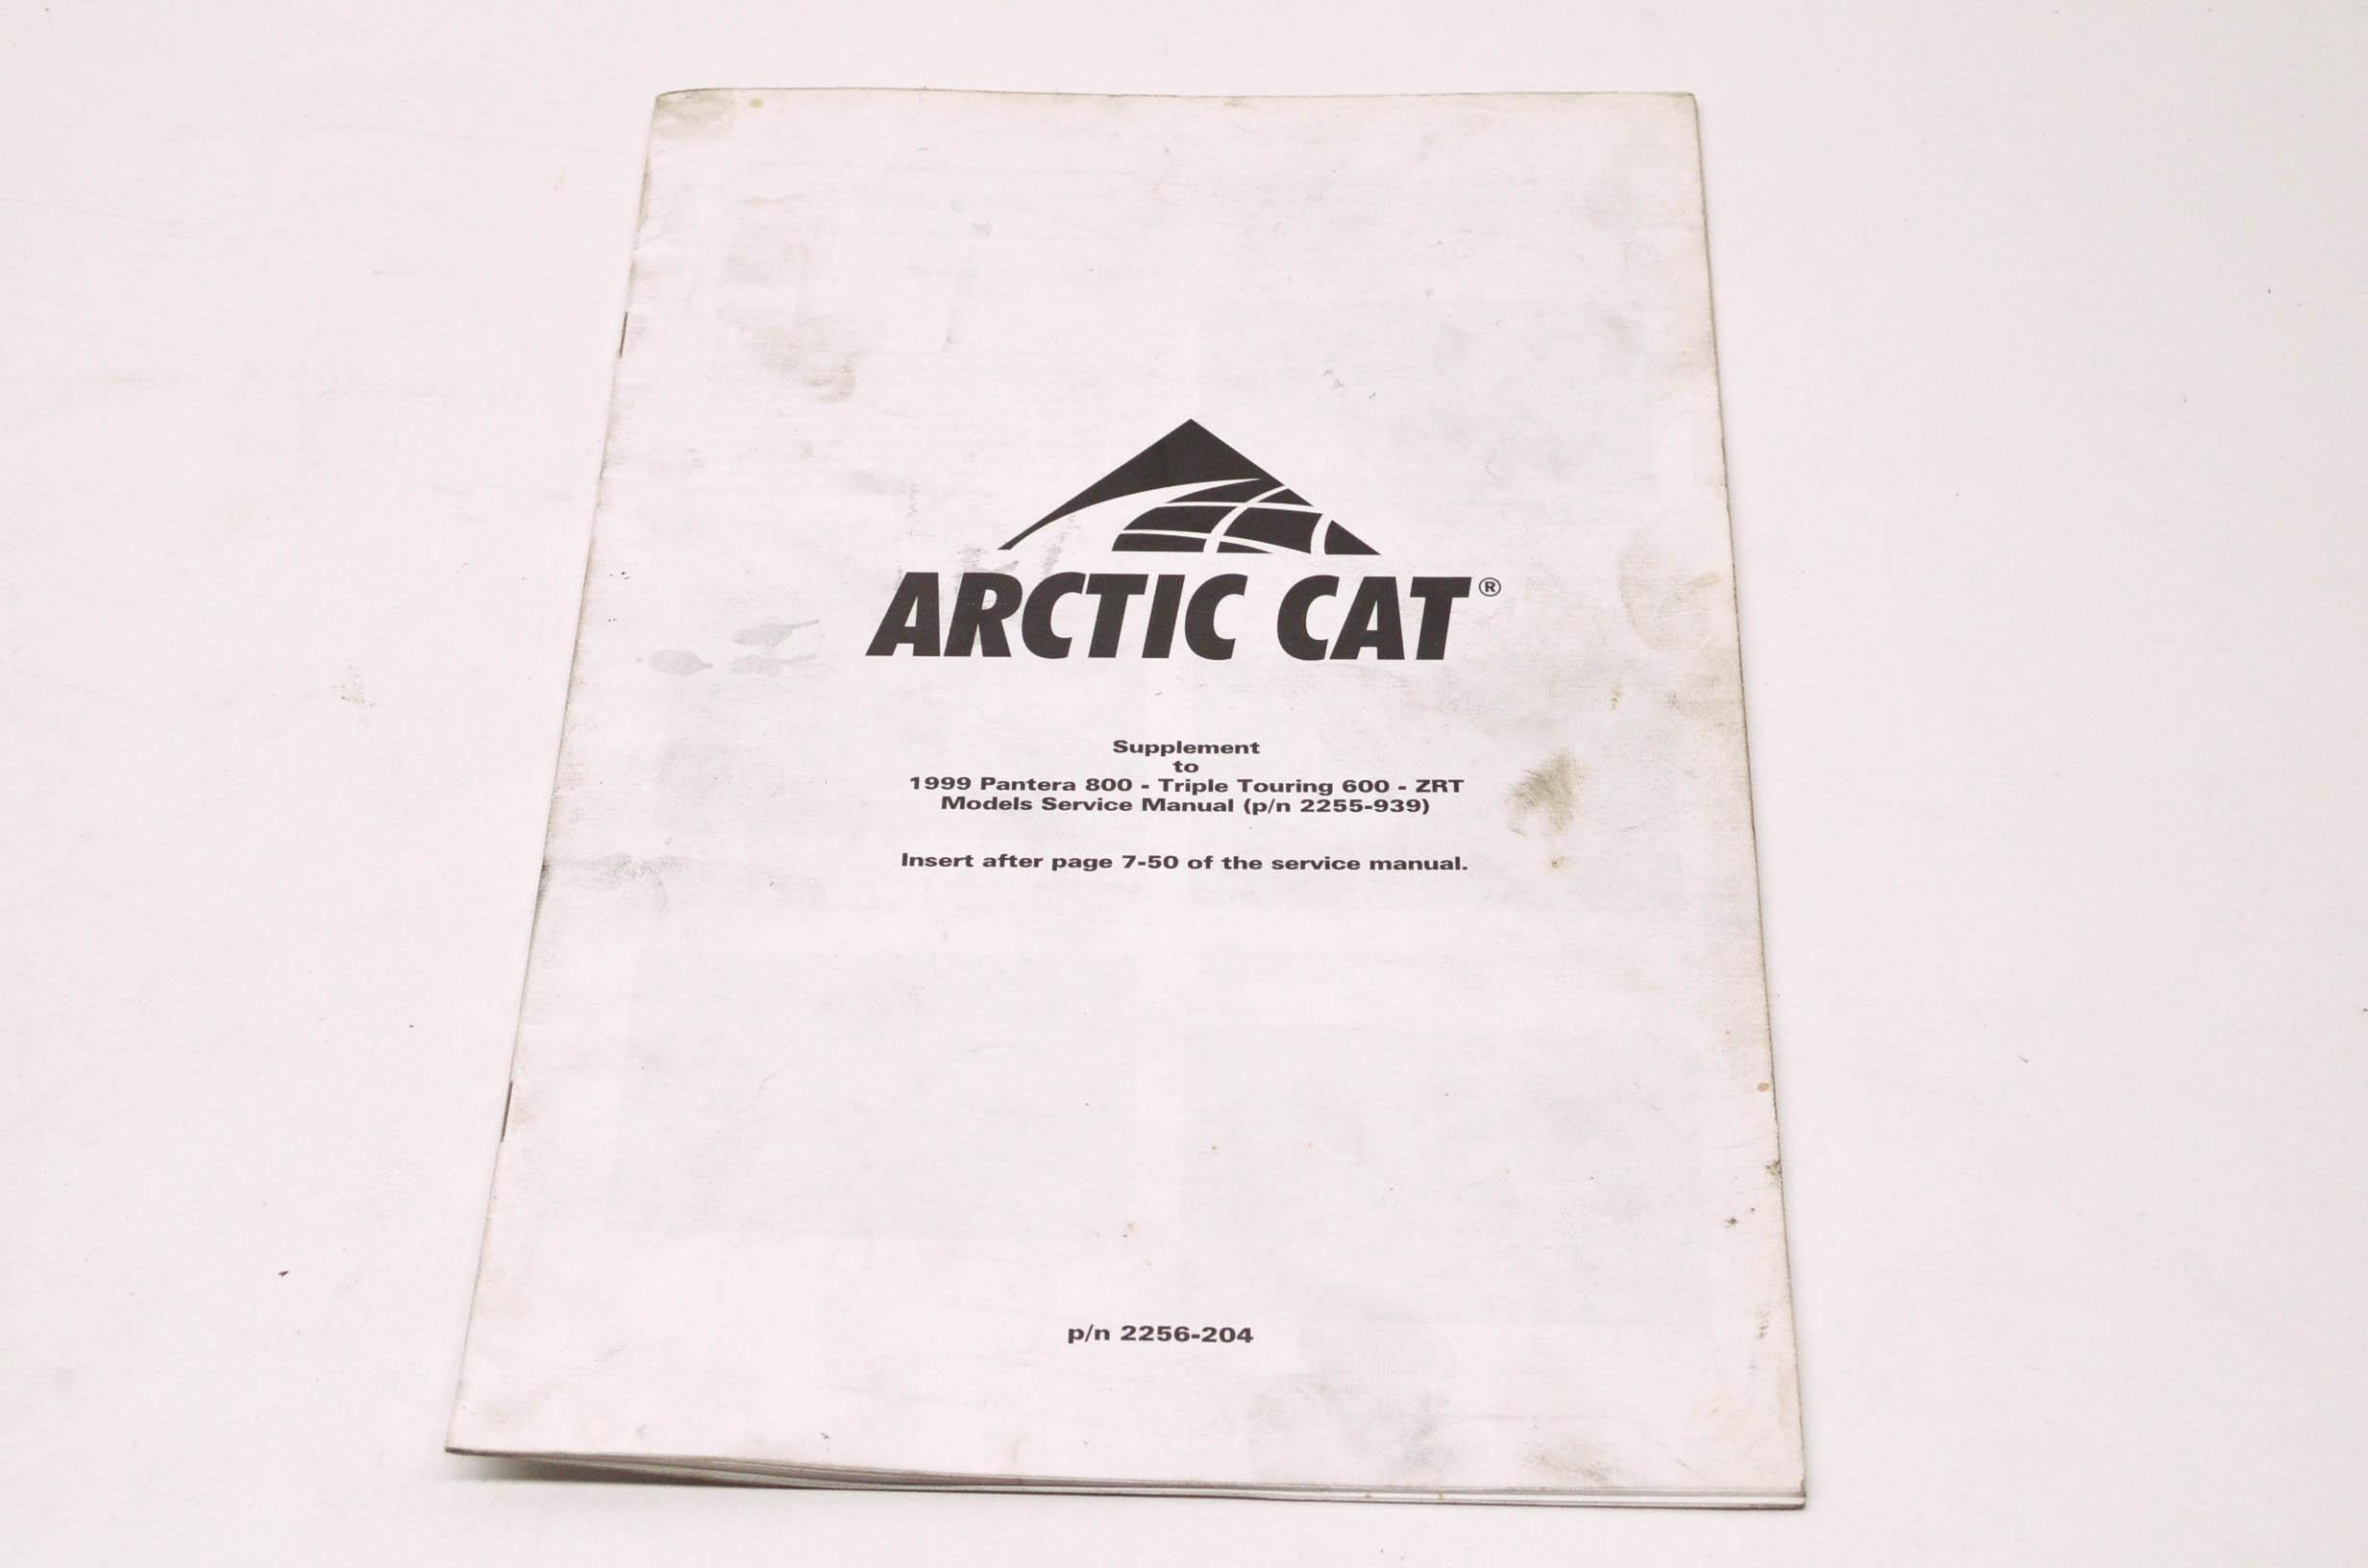 OEM Arctic Cat 2256-204 Service Manual Supplement 99